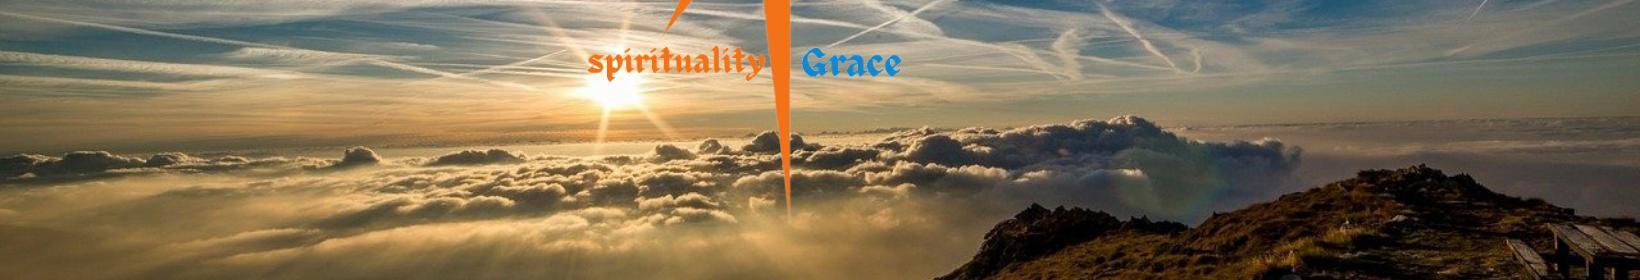 Spirituality Grace